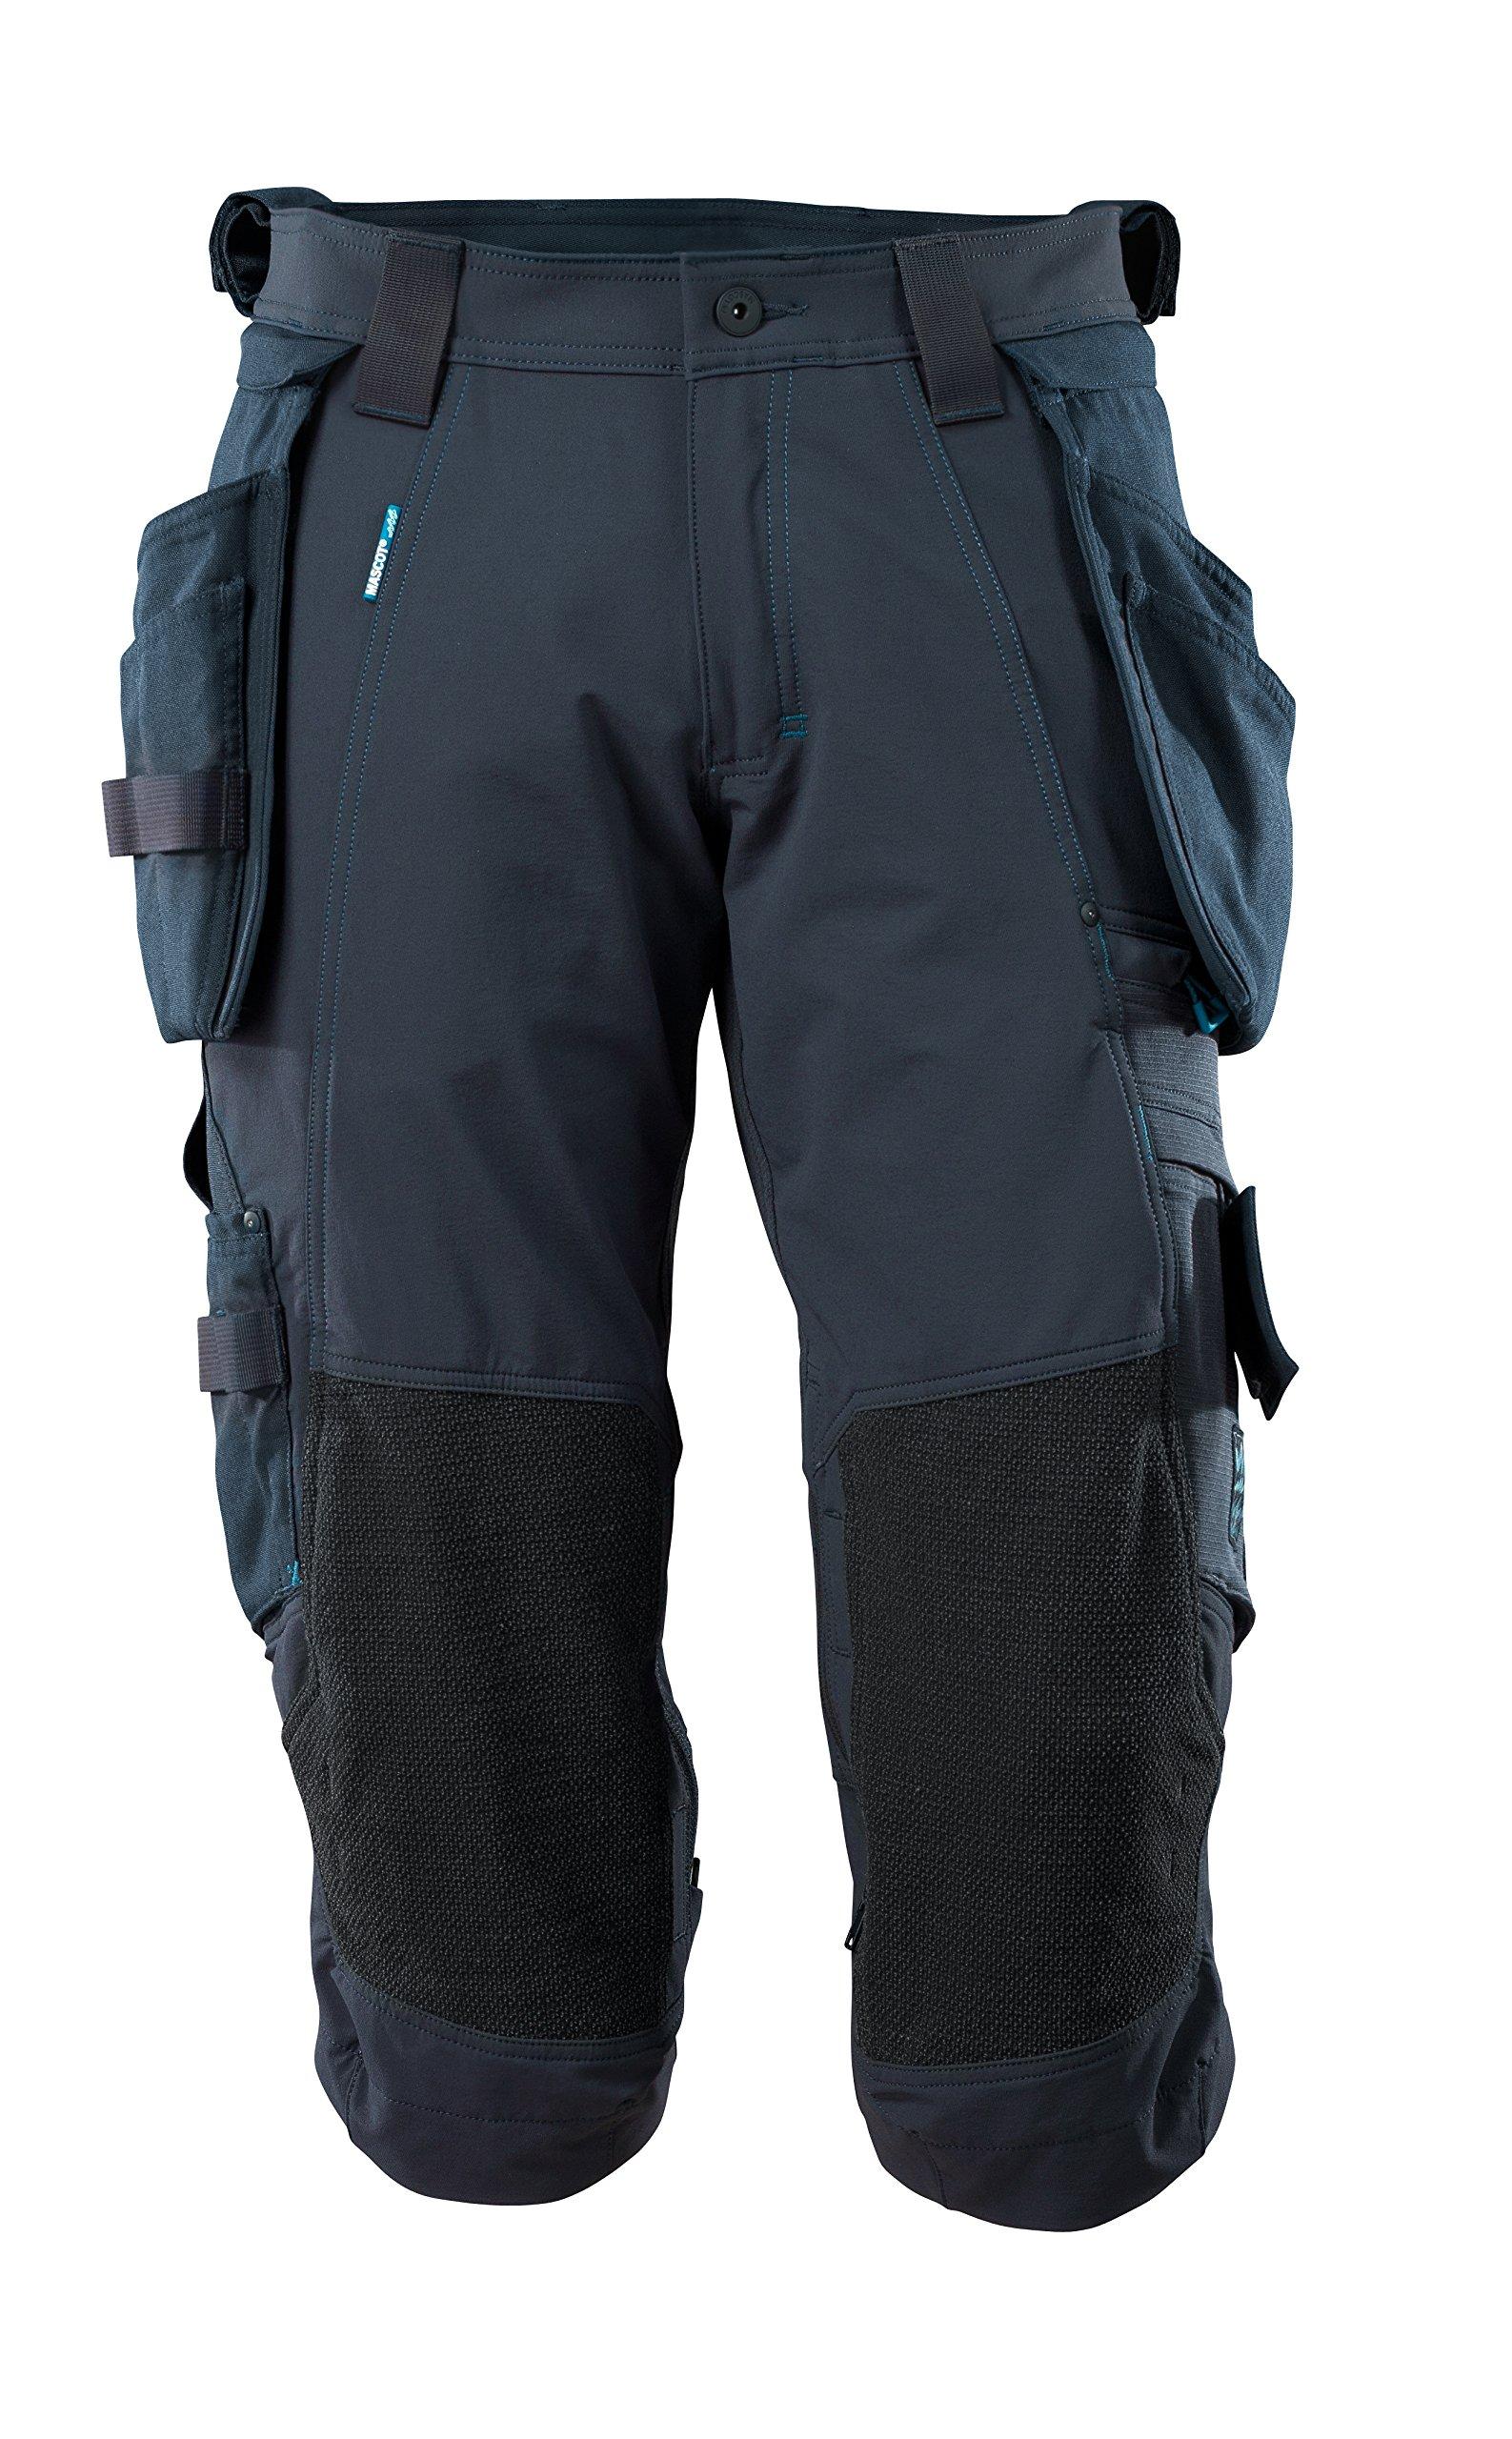 Mascot 17049-311-010-C62 Stretch Shorts Size C62, Black/Blue